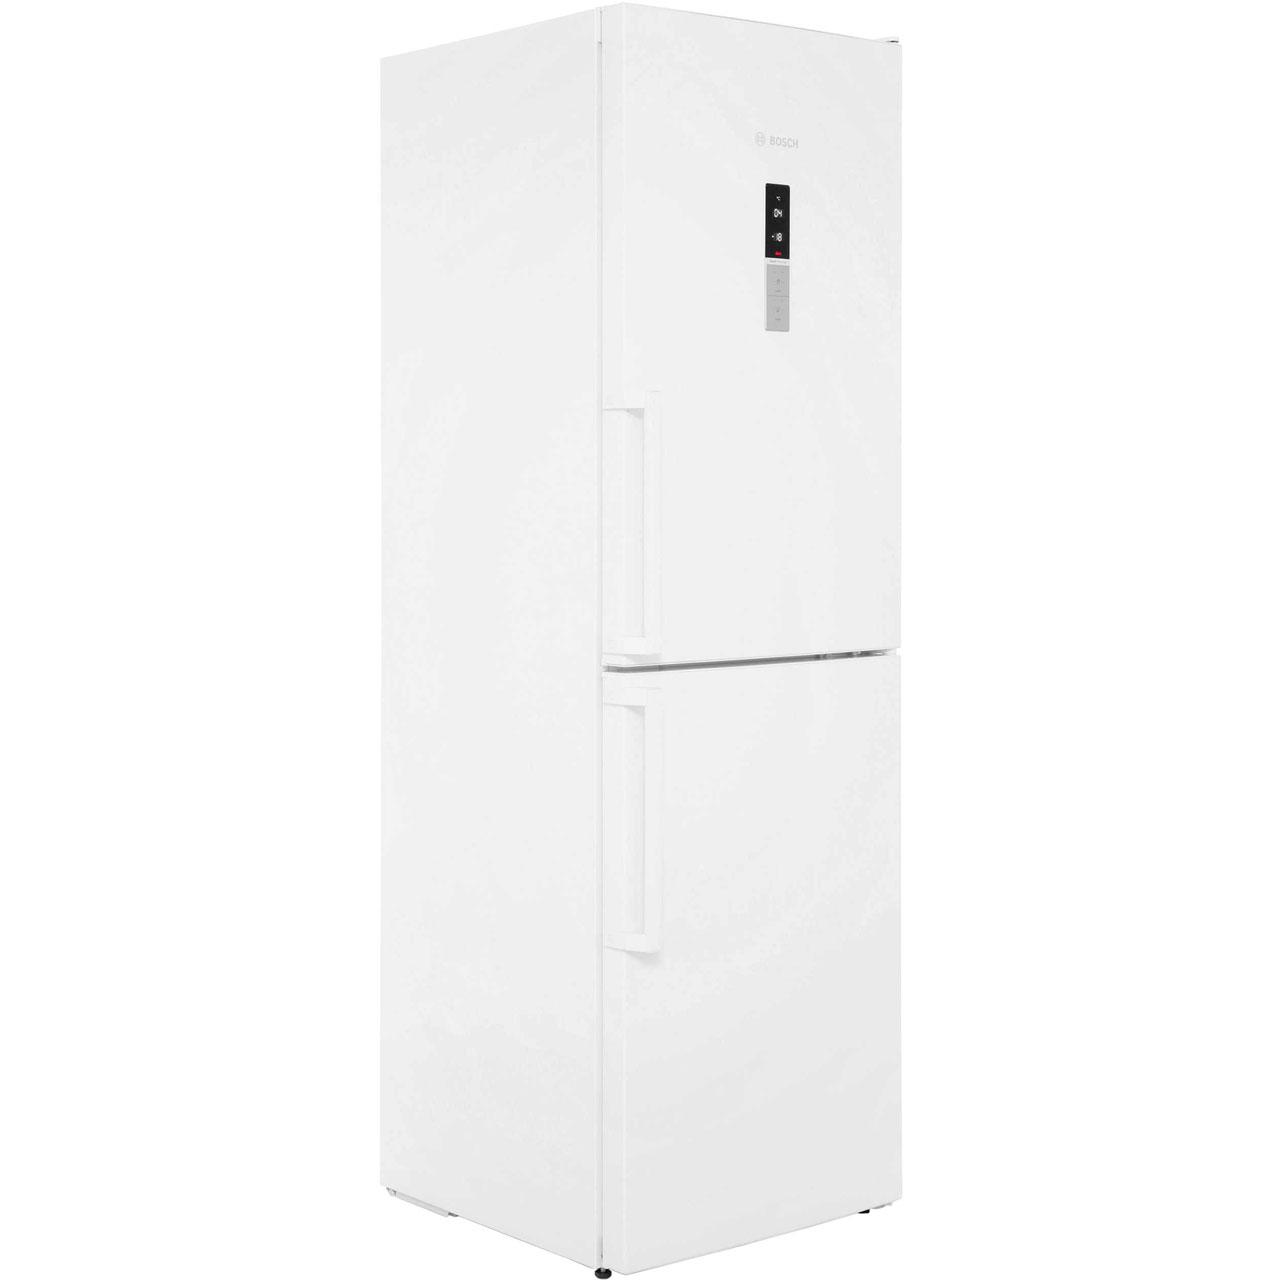 Bosch Serie 6 KGN34XW32G Free Standing Fridge Freezer Frost Free in White